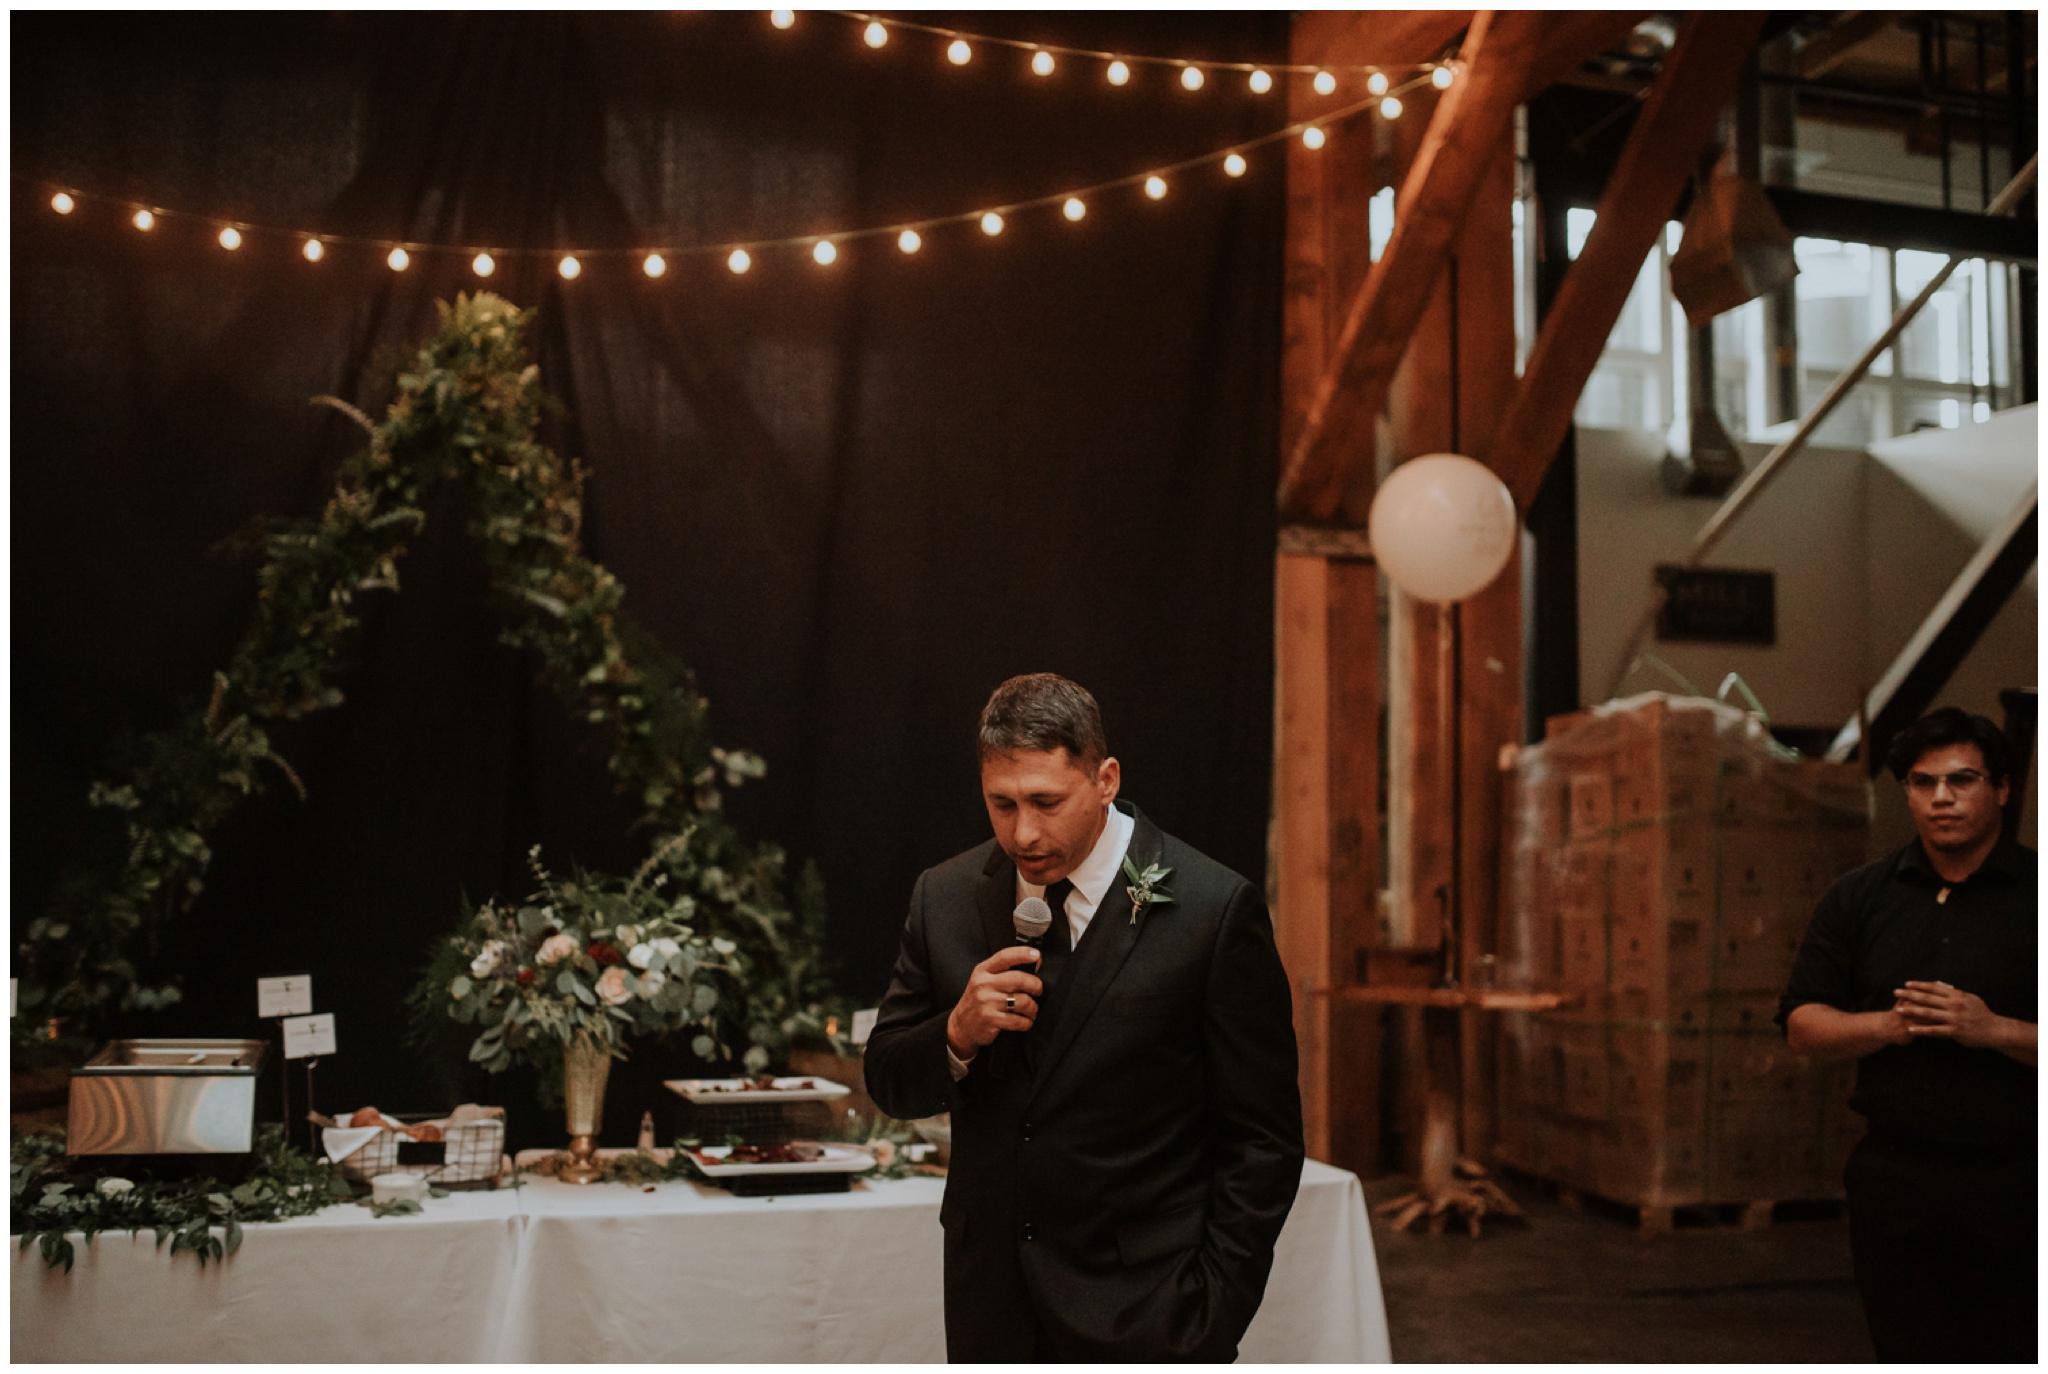 alyssa-keiran-westland-distillery-urban-seattle-wedding-photographer-caitlyn-nikula-137.jpg